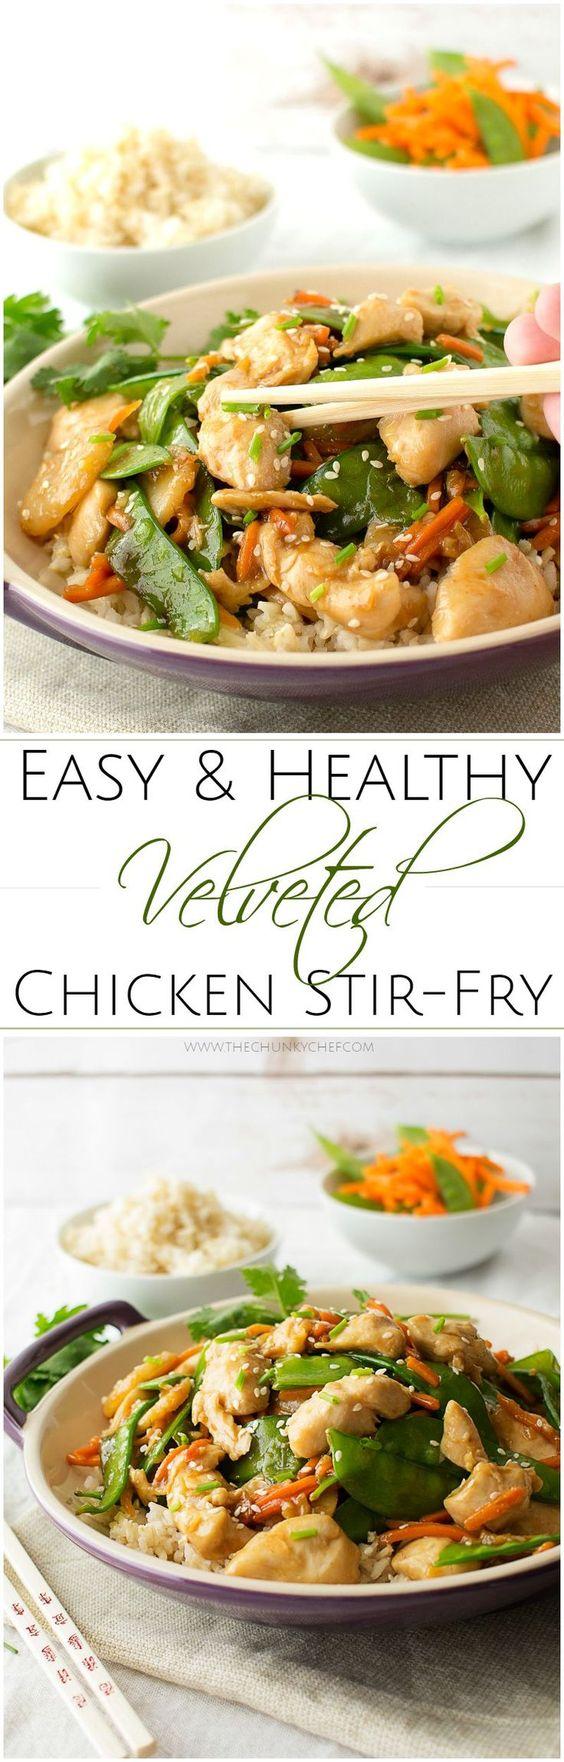 Stir-Fried Velvet Chicken With Snap Peas And Lemon-Ginger Sauce Recipe ...